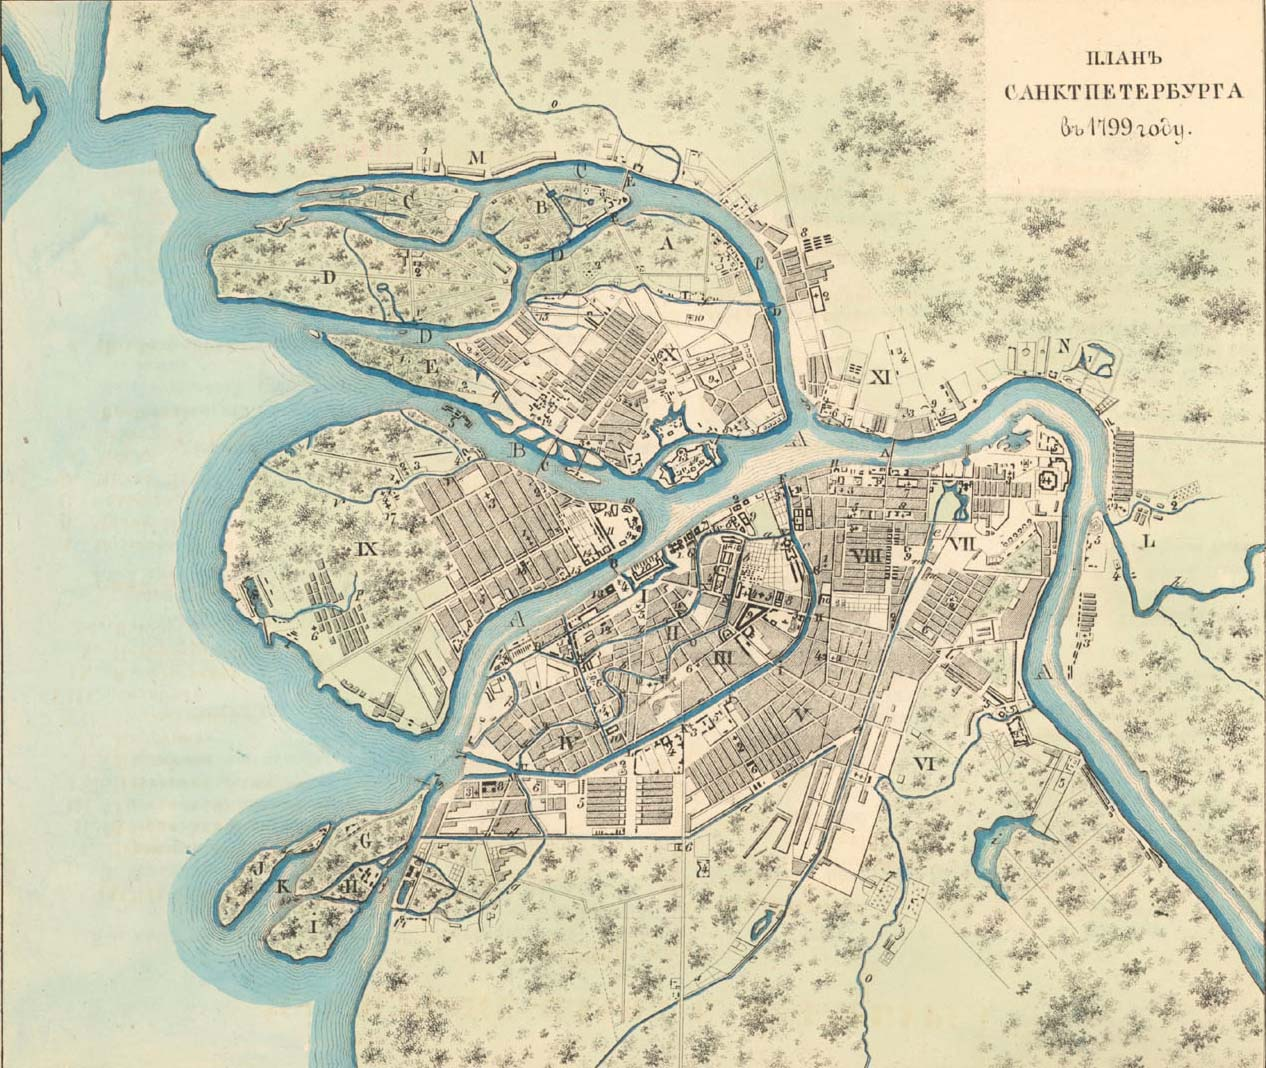 План Санкт-Петербурга в 1799 году: www.akland.ru/arhiv/kart/karta_arhiv/page_arhiv/karta_arhiv_03.htm